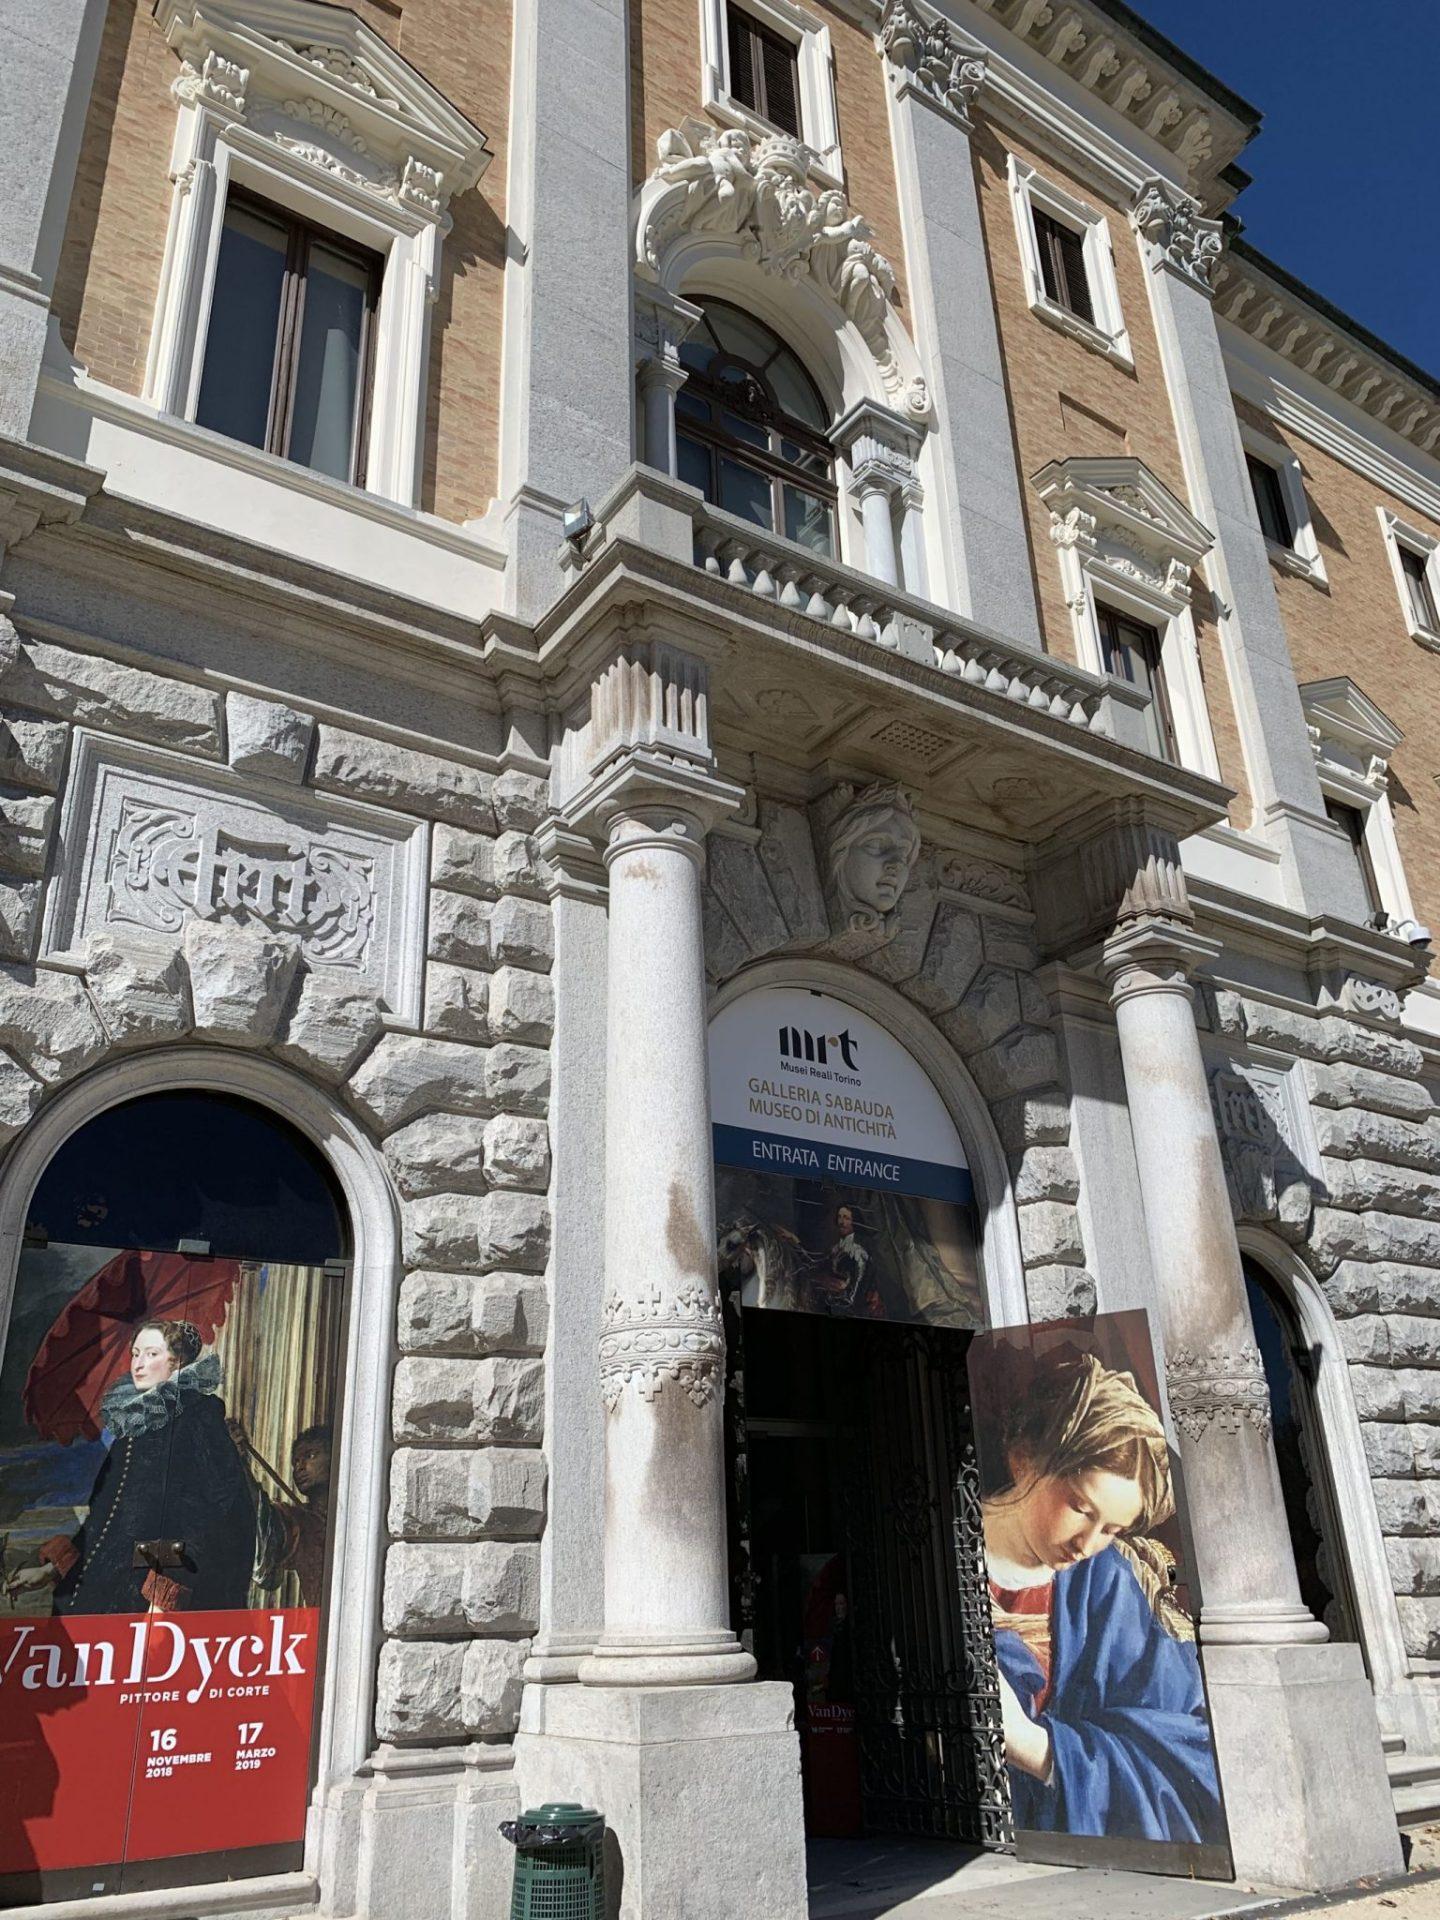 vand dyck in turin gallery - Van Dyck in Turin